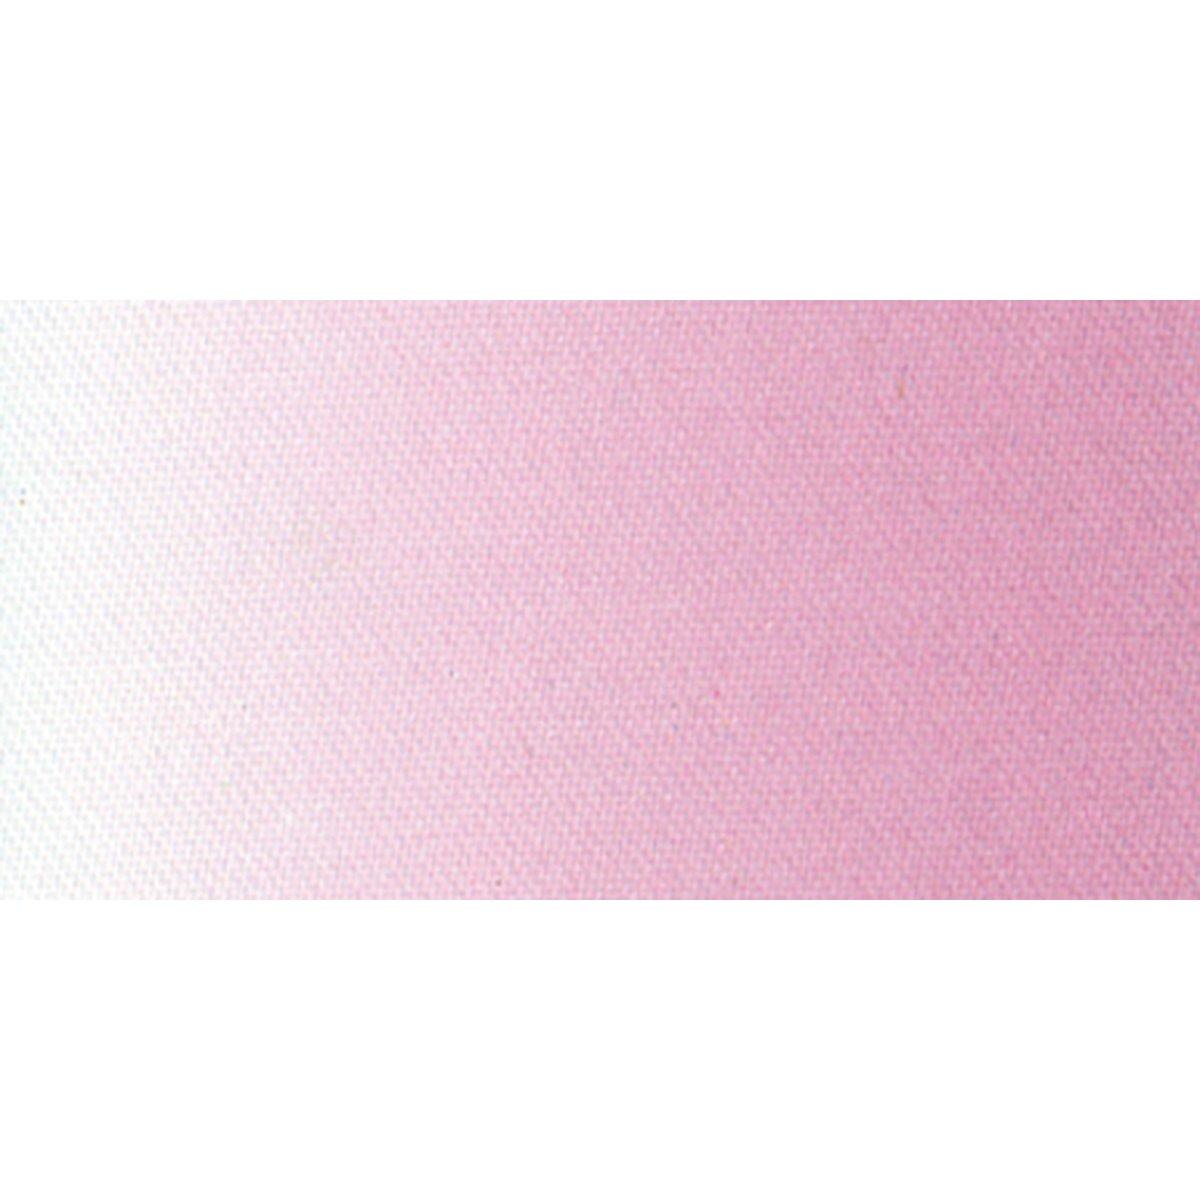 Wrights 117-798-1333 Printed Single Fold Satin